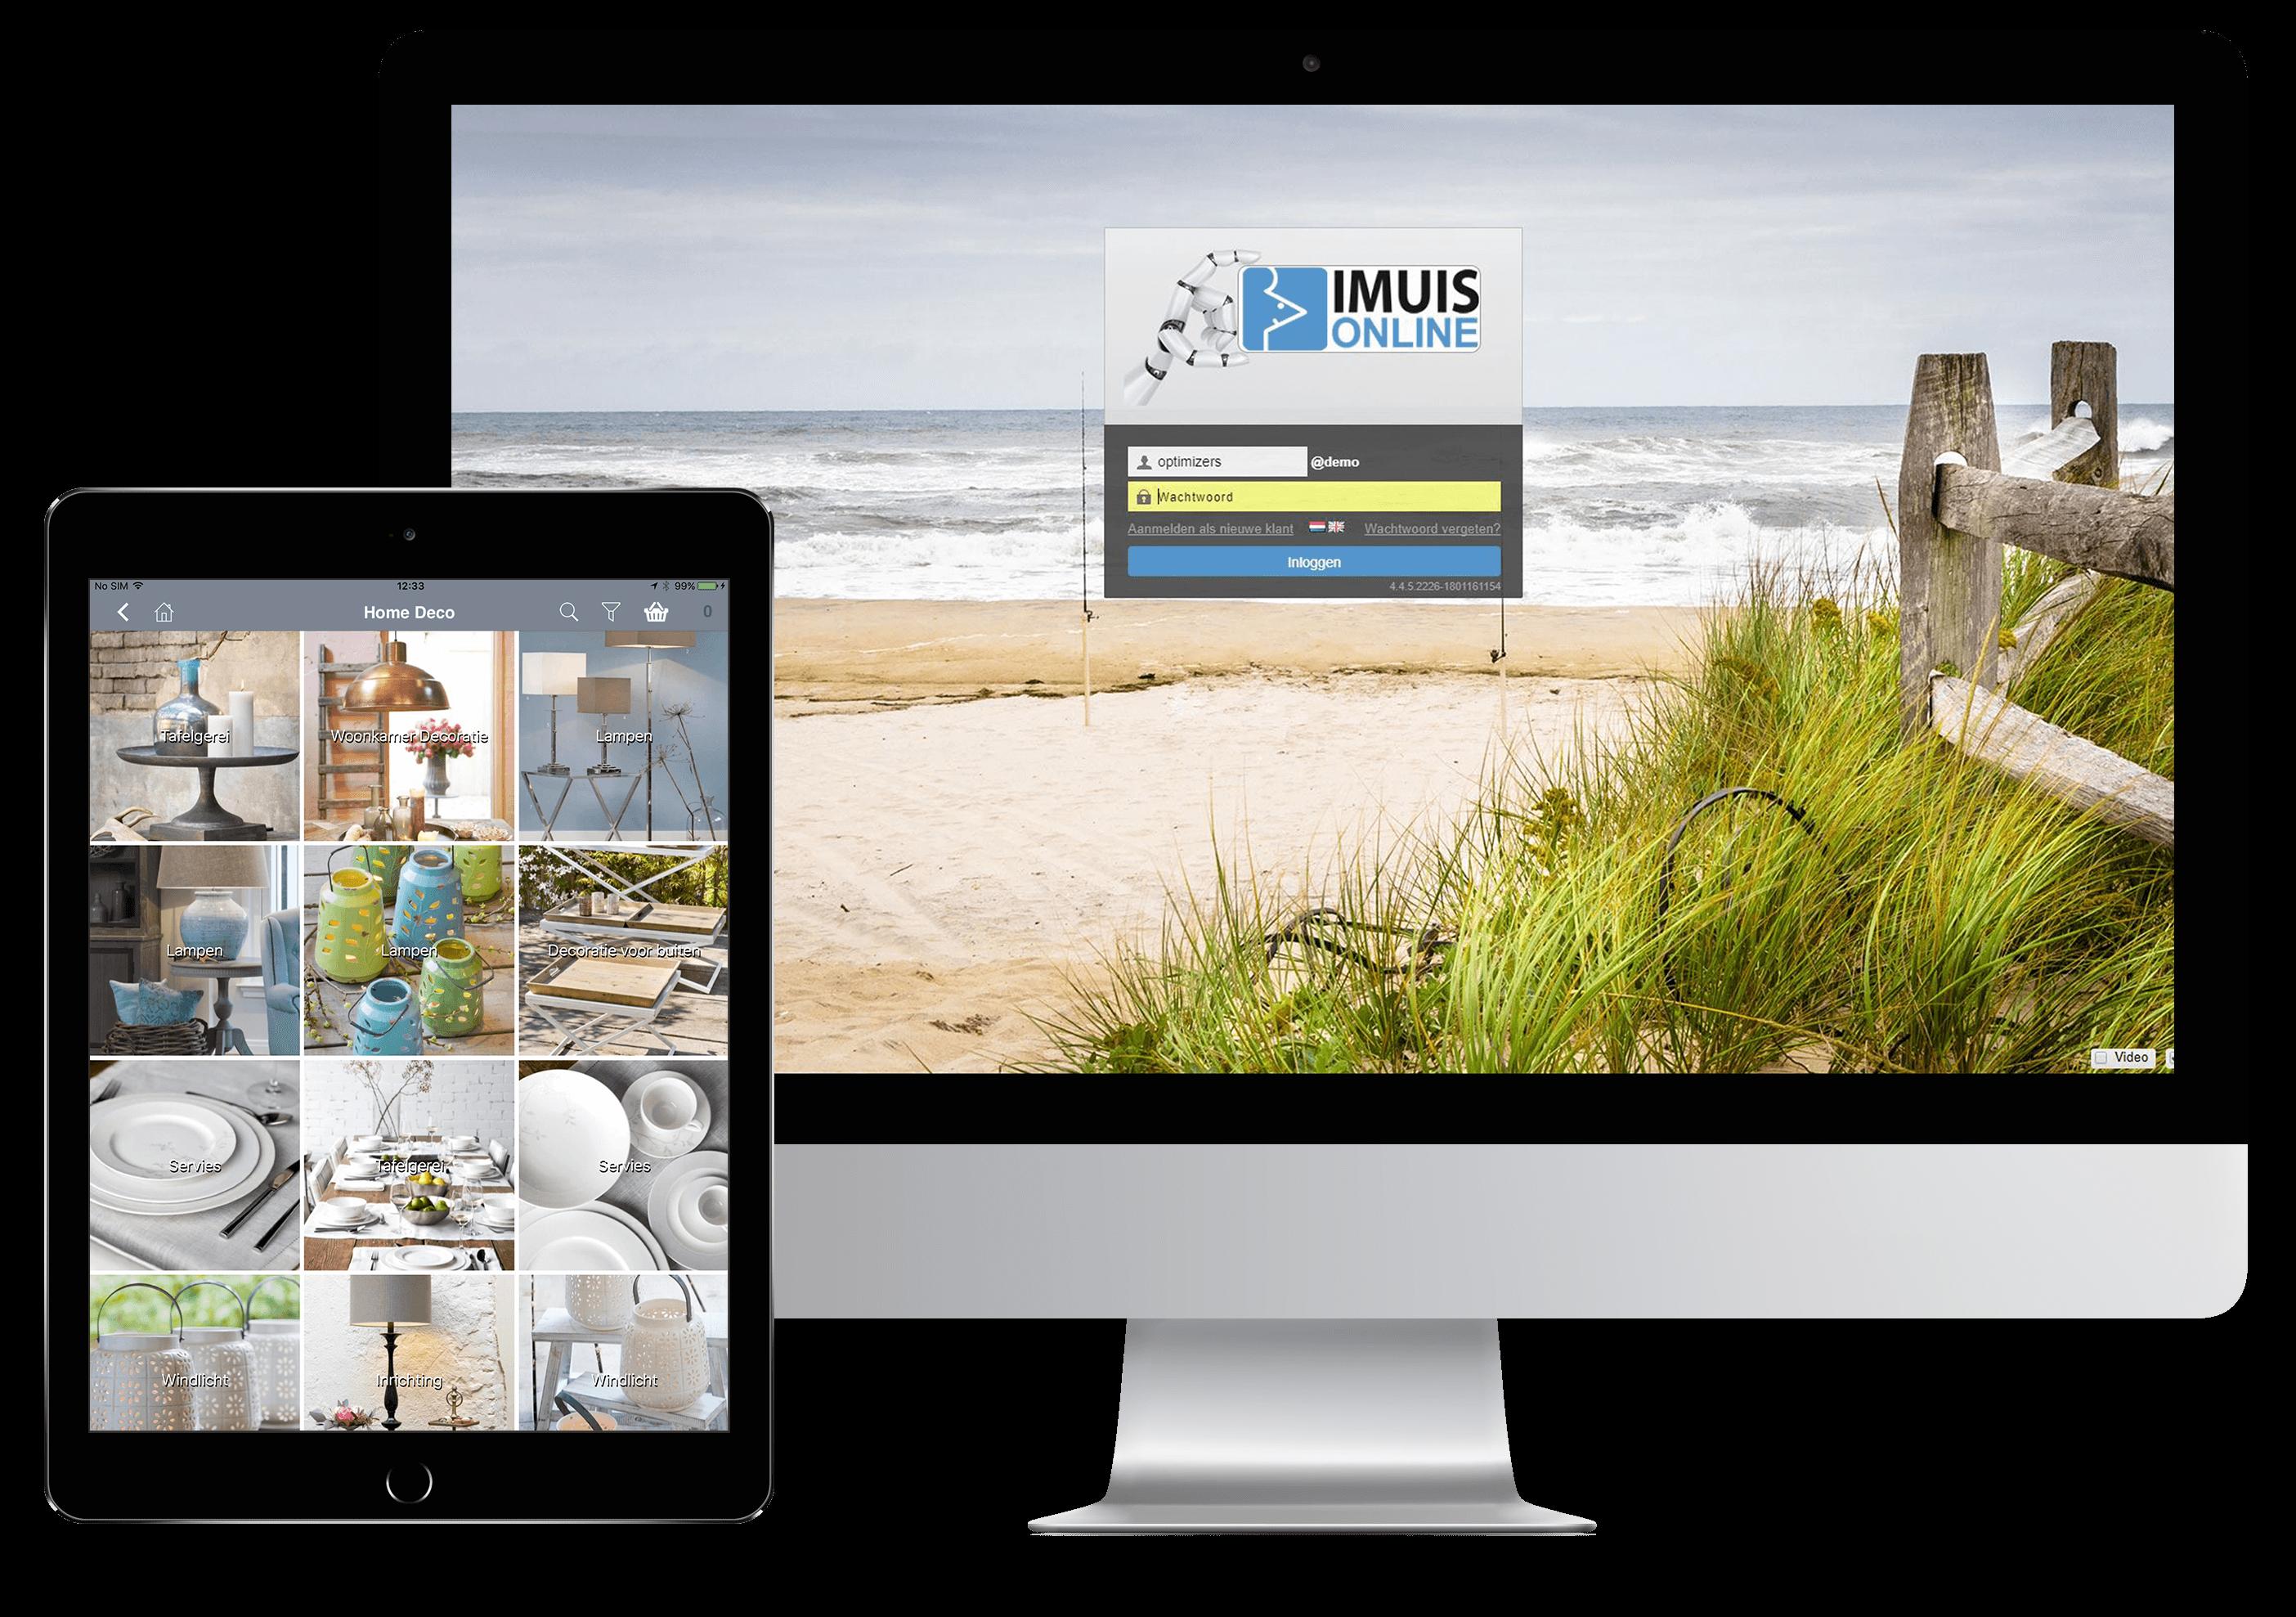 App4Sales iMuis iMac Tablet